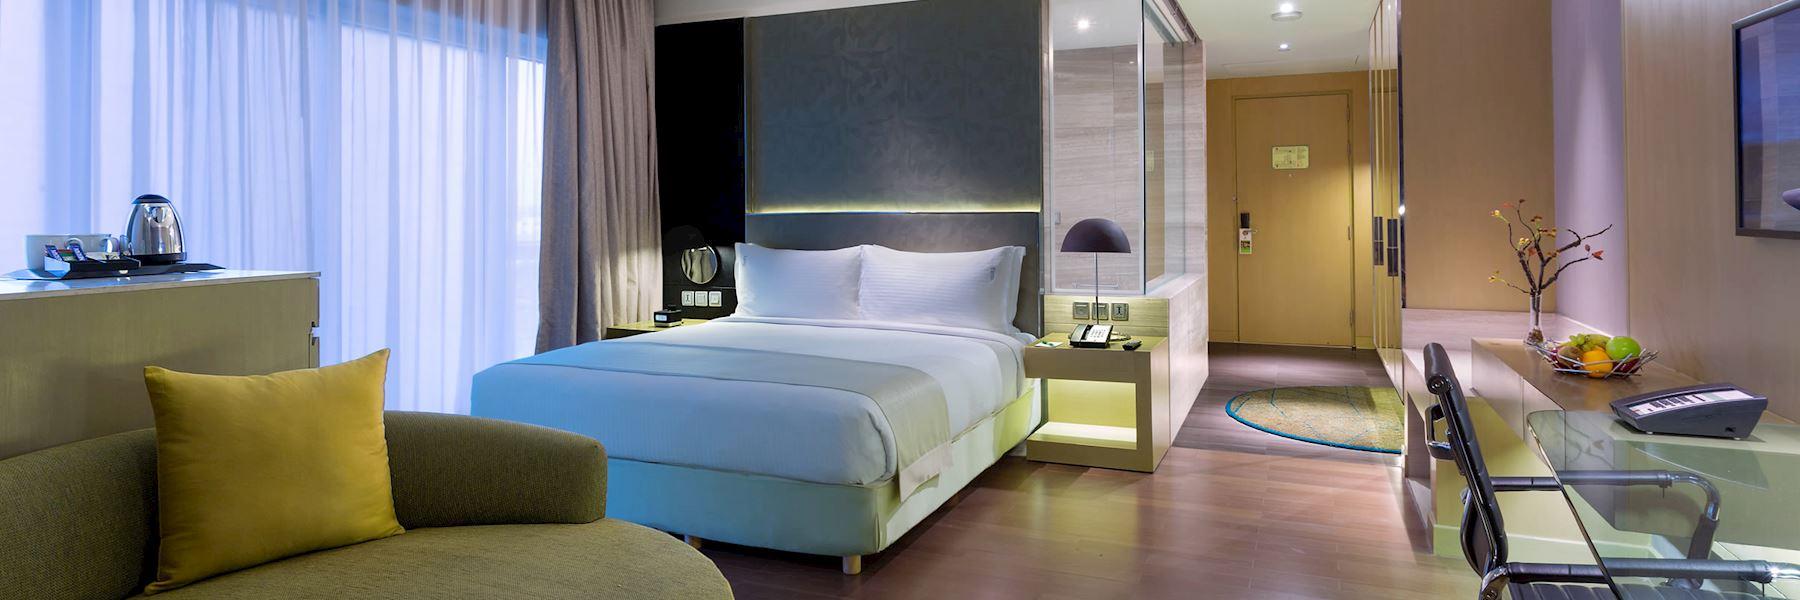 Holiday Inn Aerocity